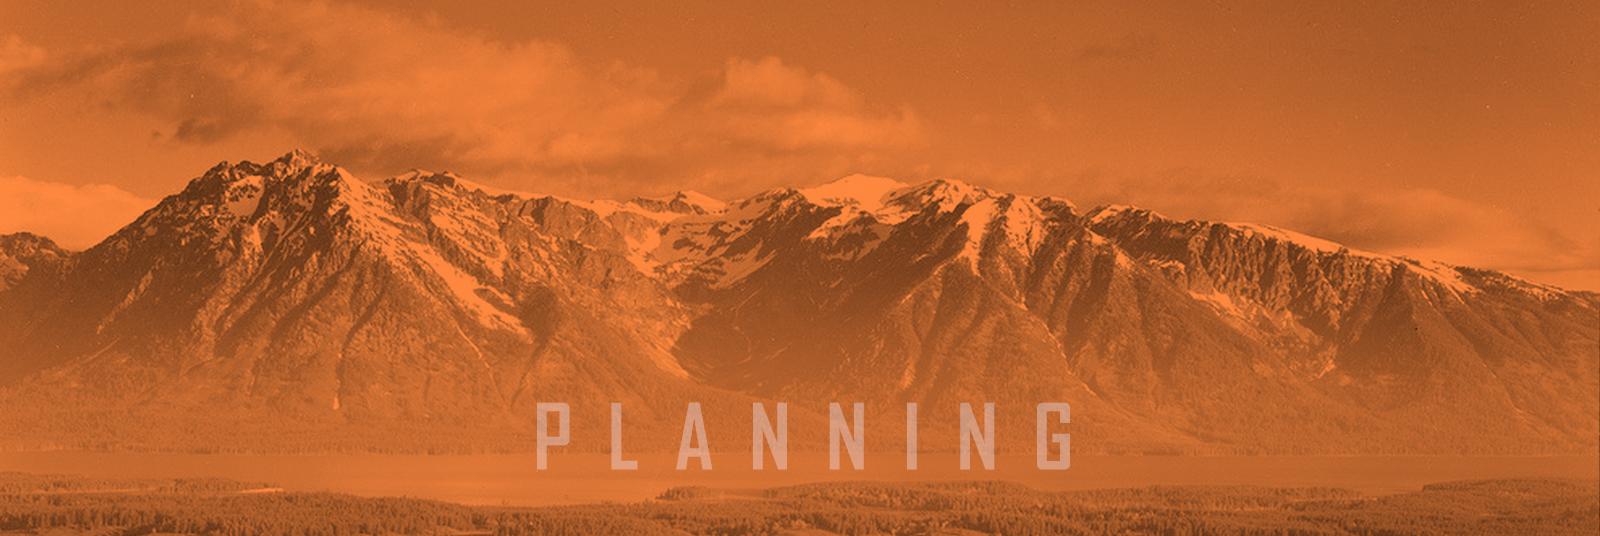 03 Planning.jpg